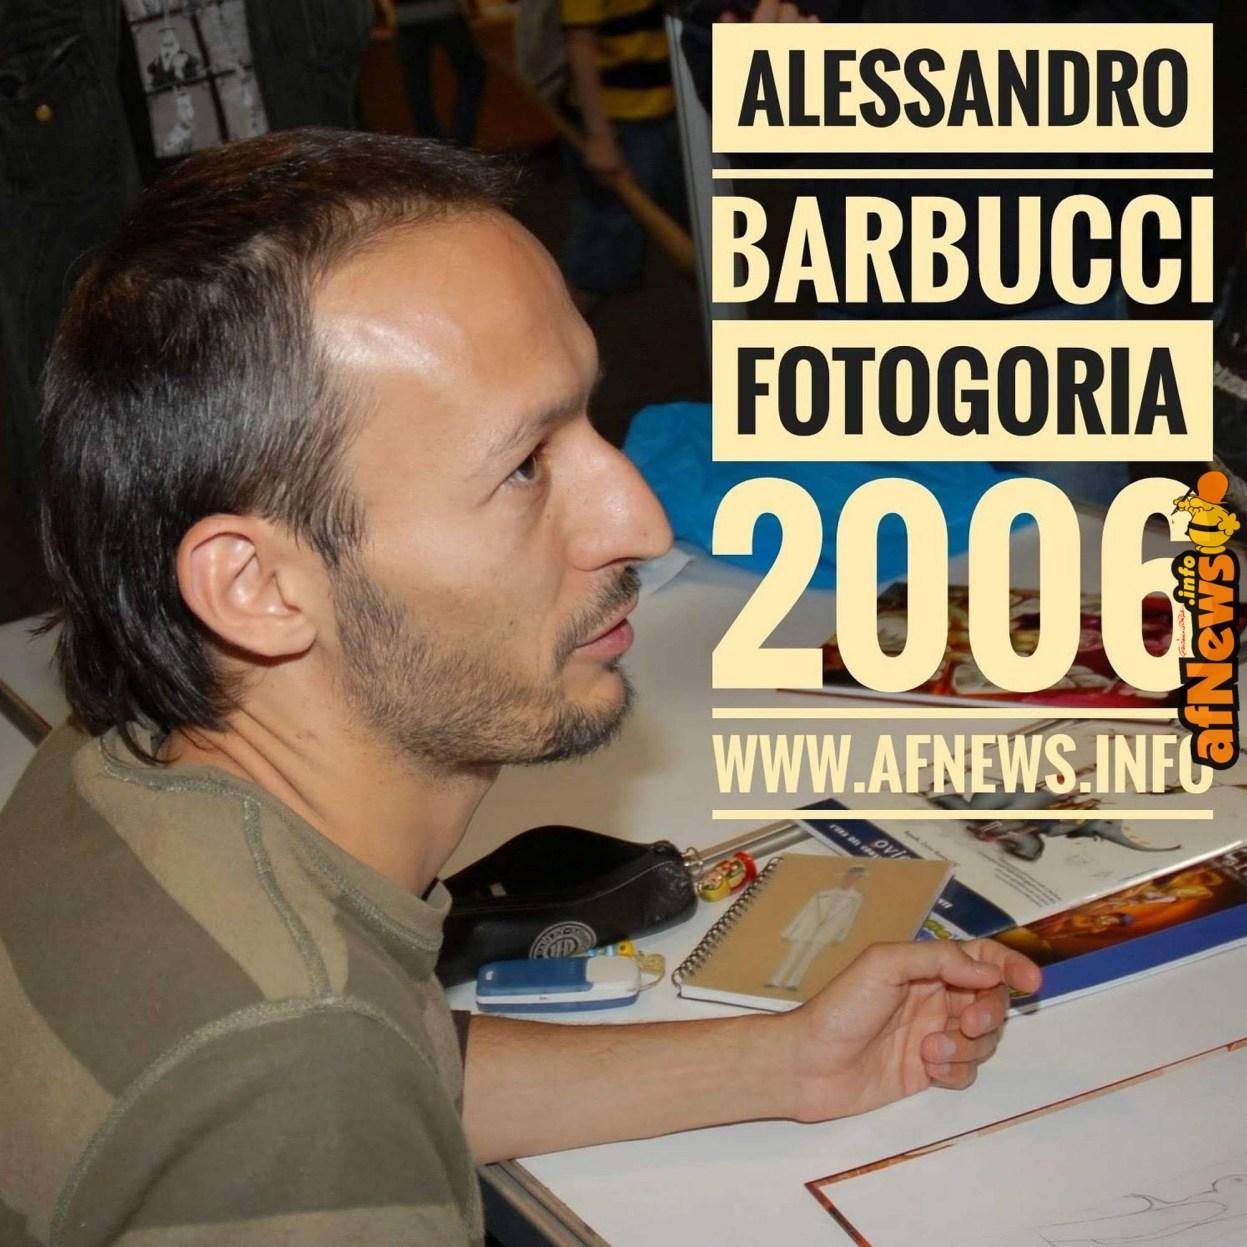 IMG_20190529_161048_050 Alessandro Barbucci-afnews